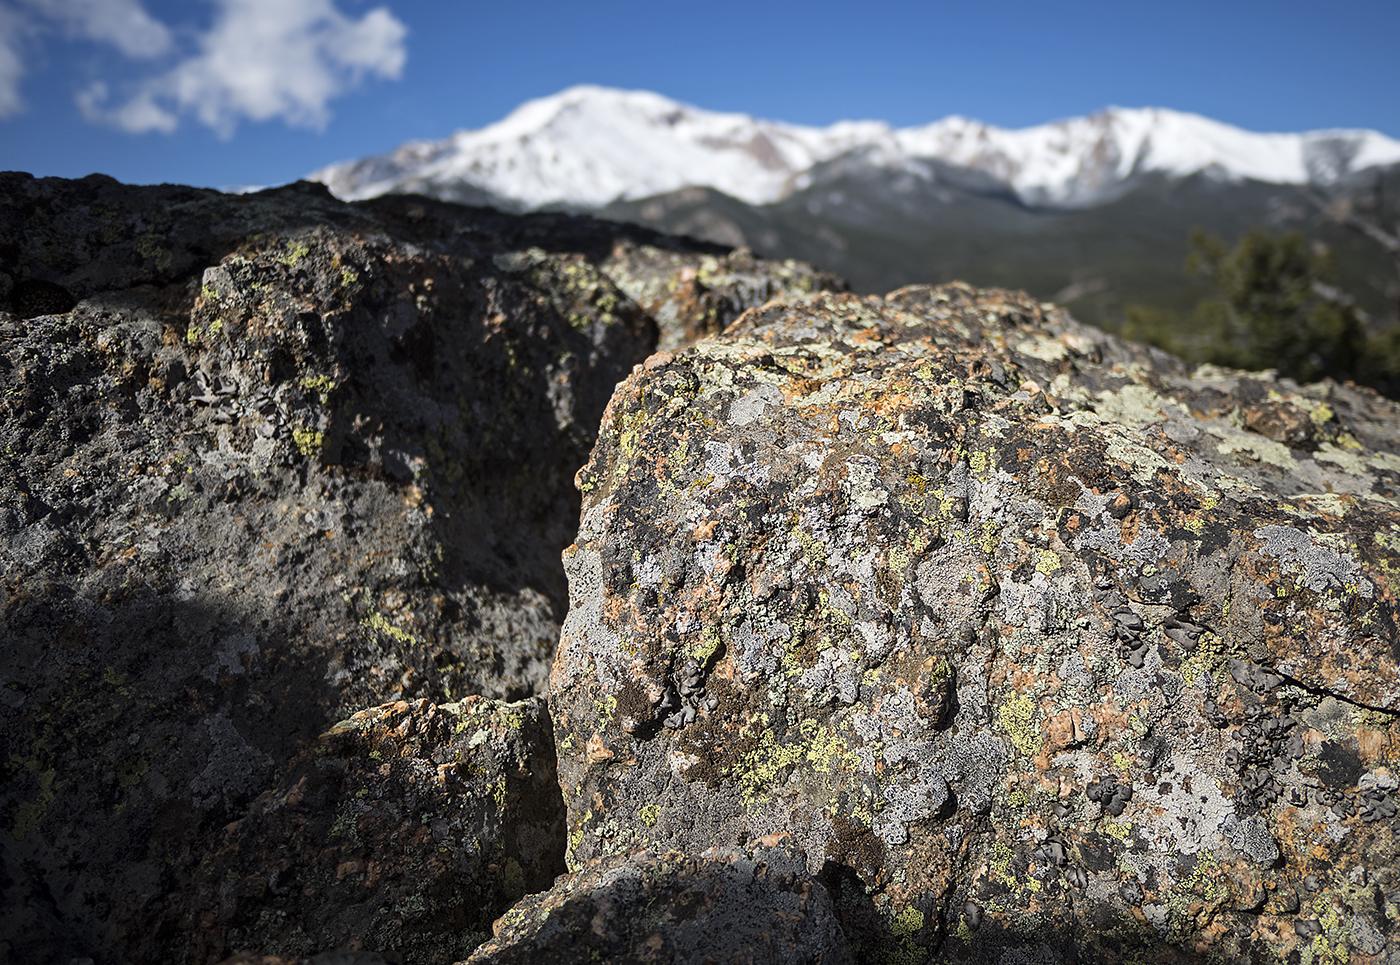 moss, mosses, lichen, mountains